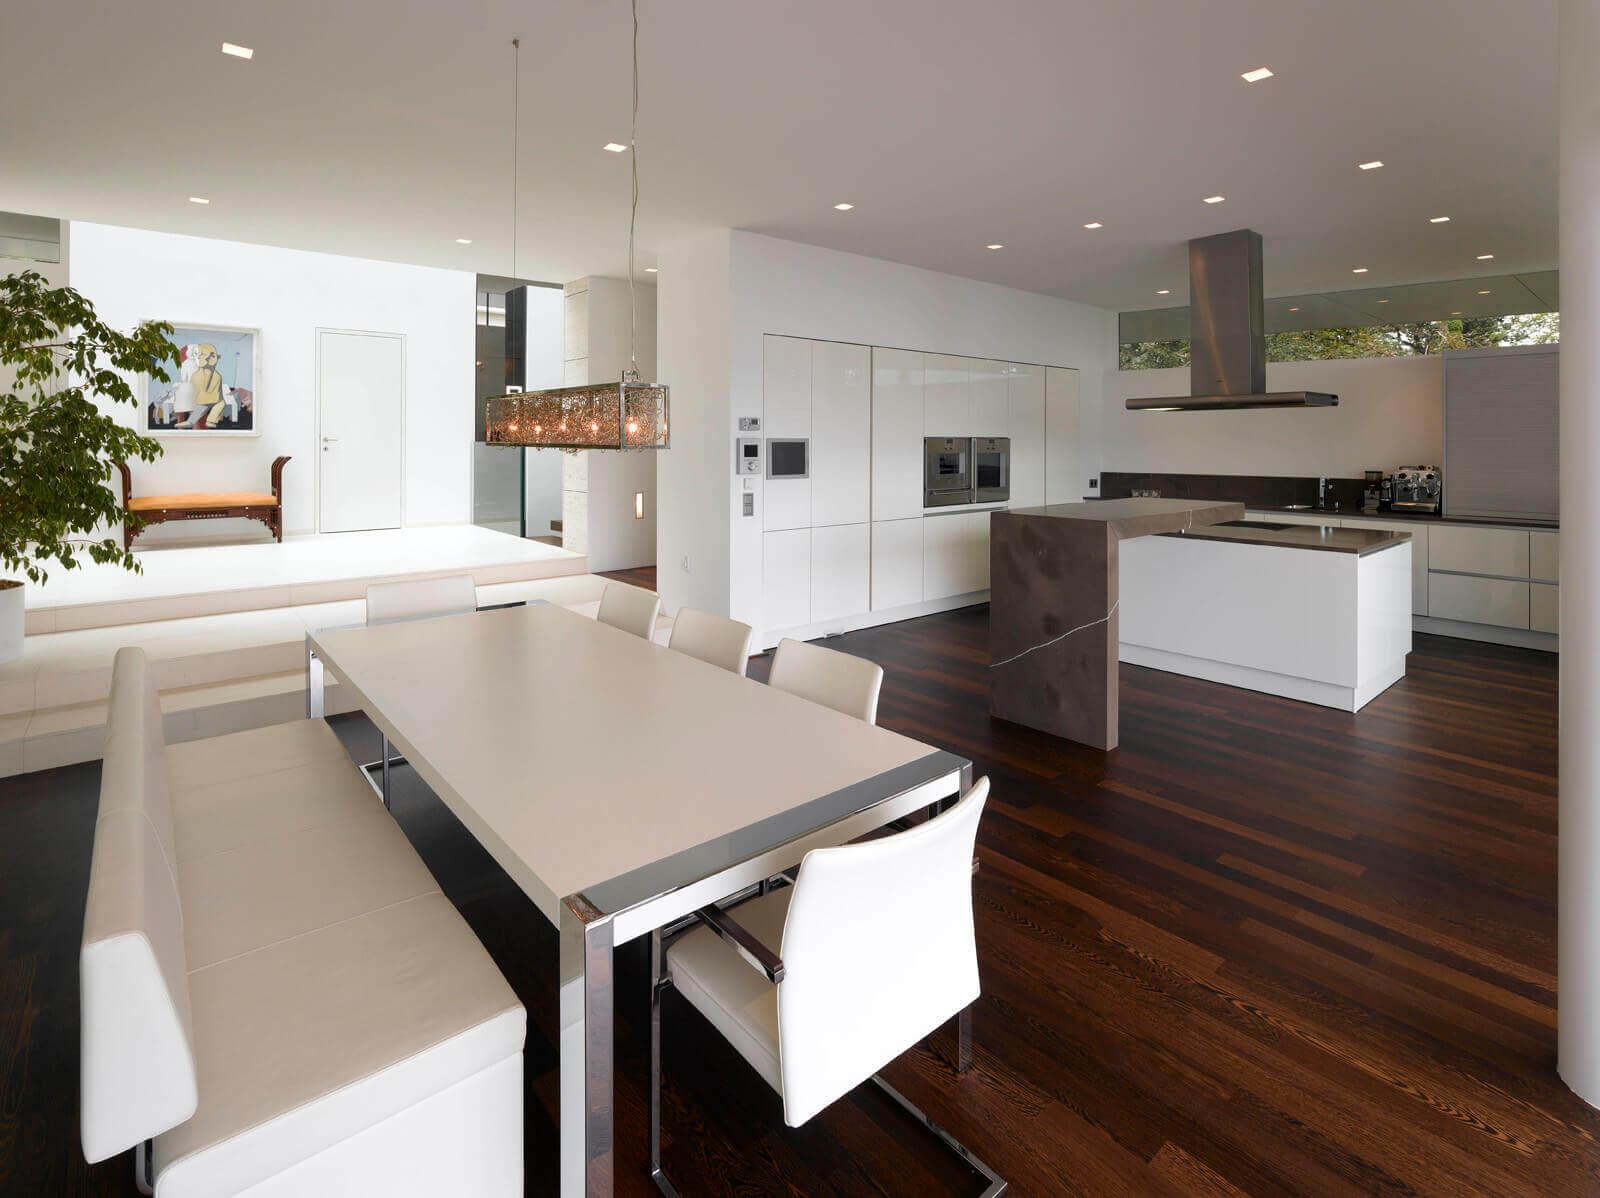 Contemporary Kitchen Family Room Ideas